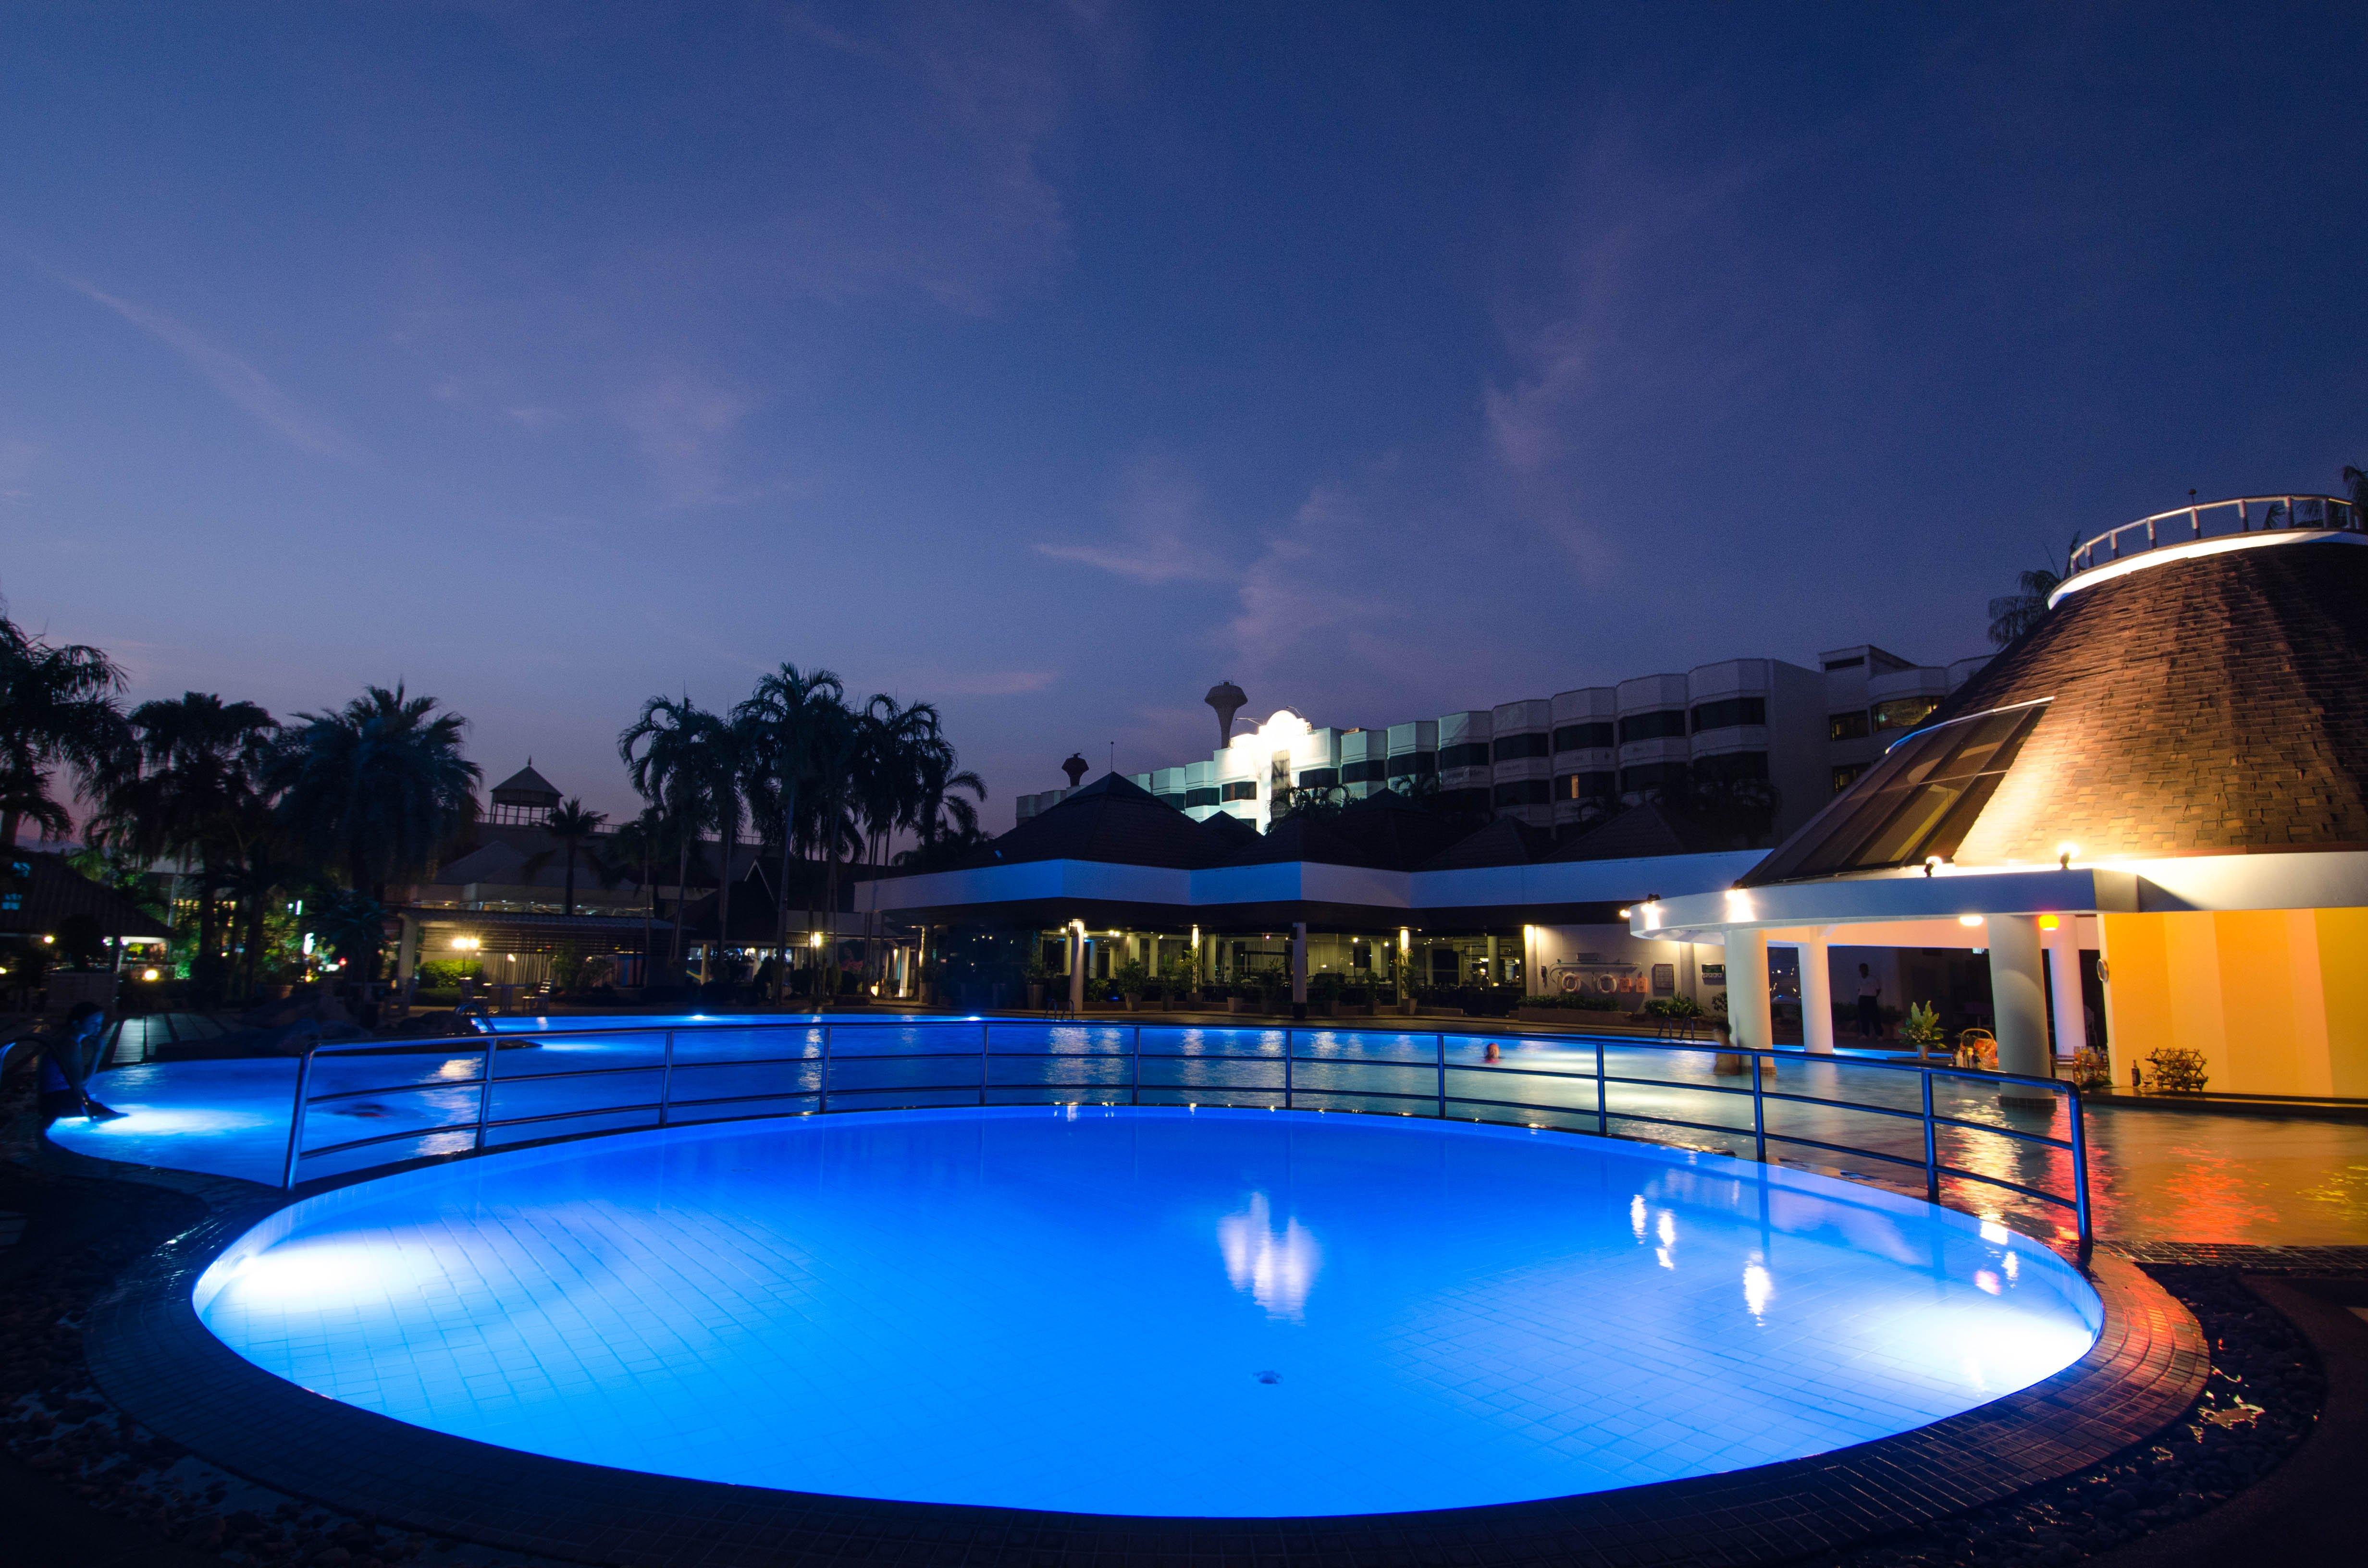 Amarin Lagoon Hotel